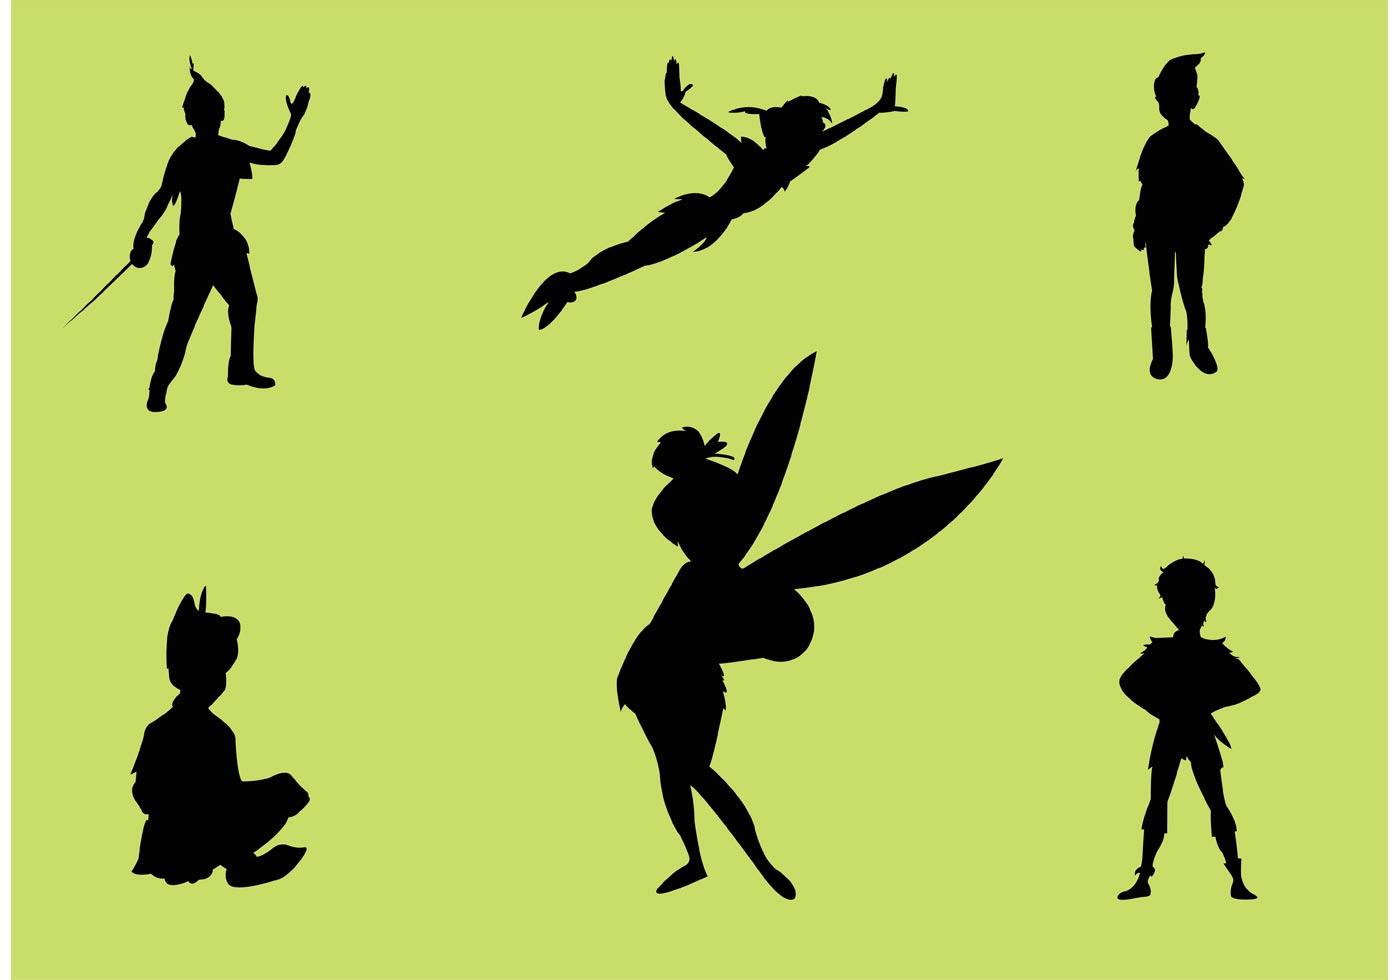 peter pan silhouette free vector art 10899 free downloads